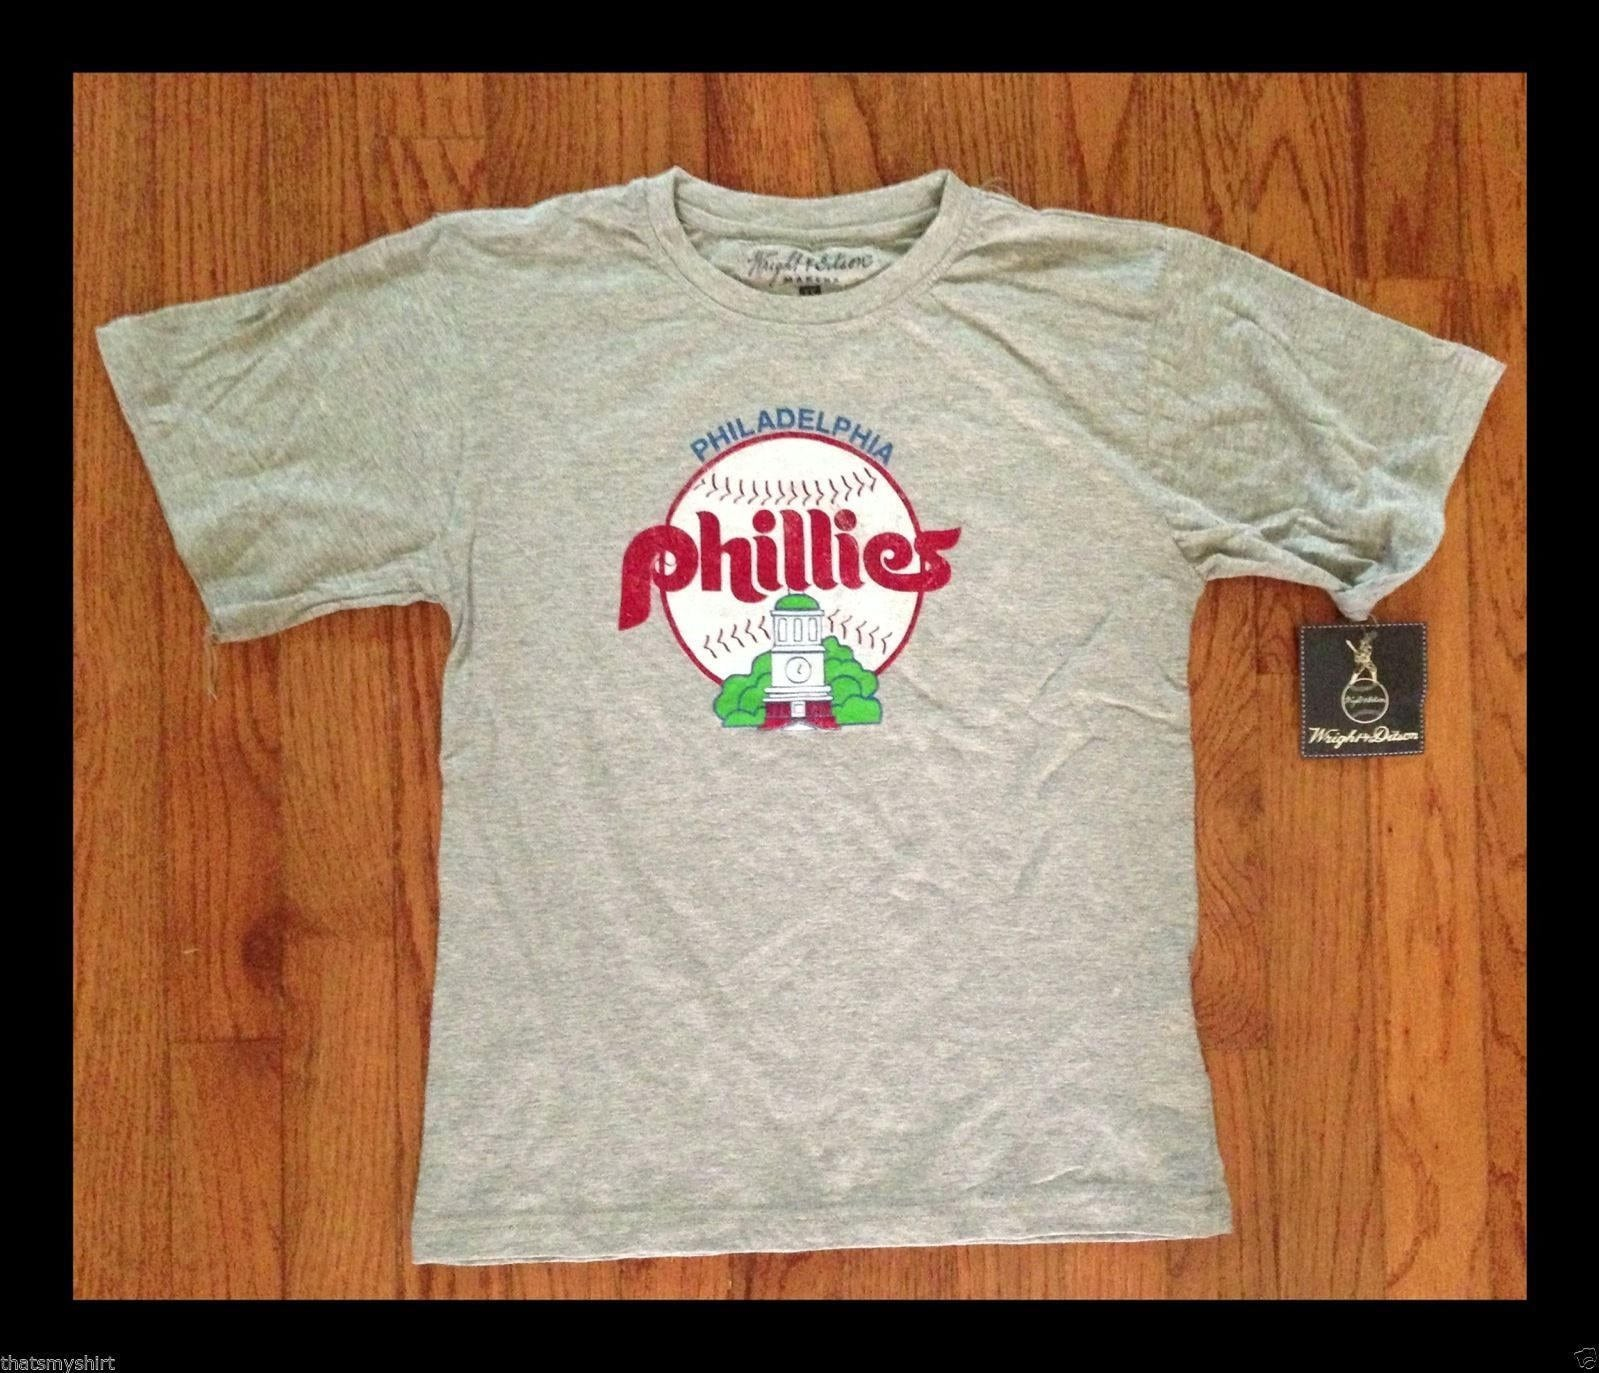 15691802 Retro Philadelphia Phillies Vintage Style Youth T-Shirt   Etsy